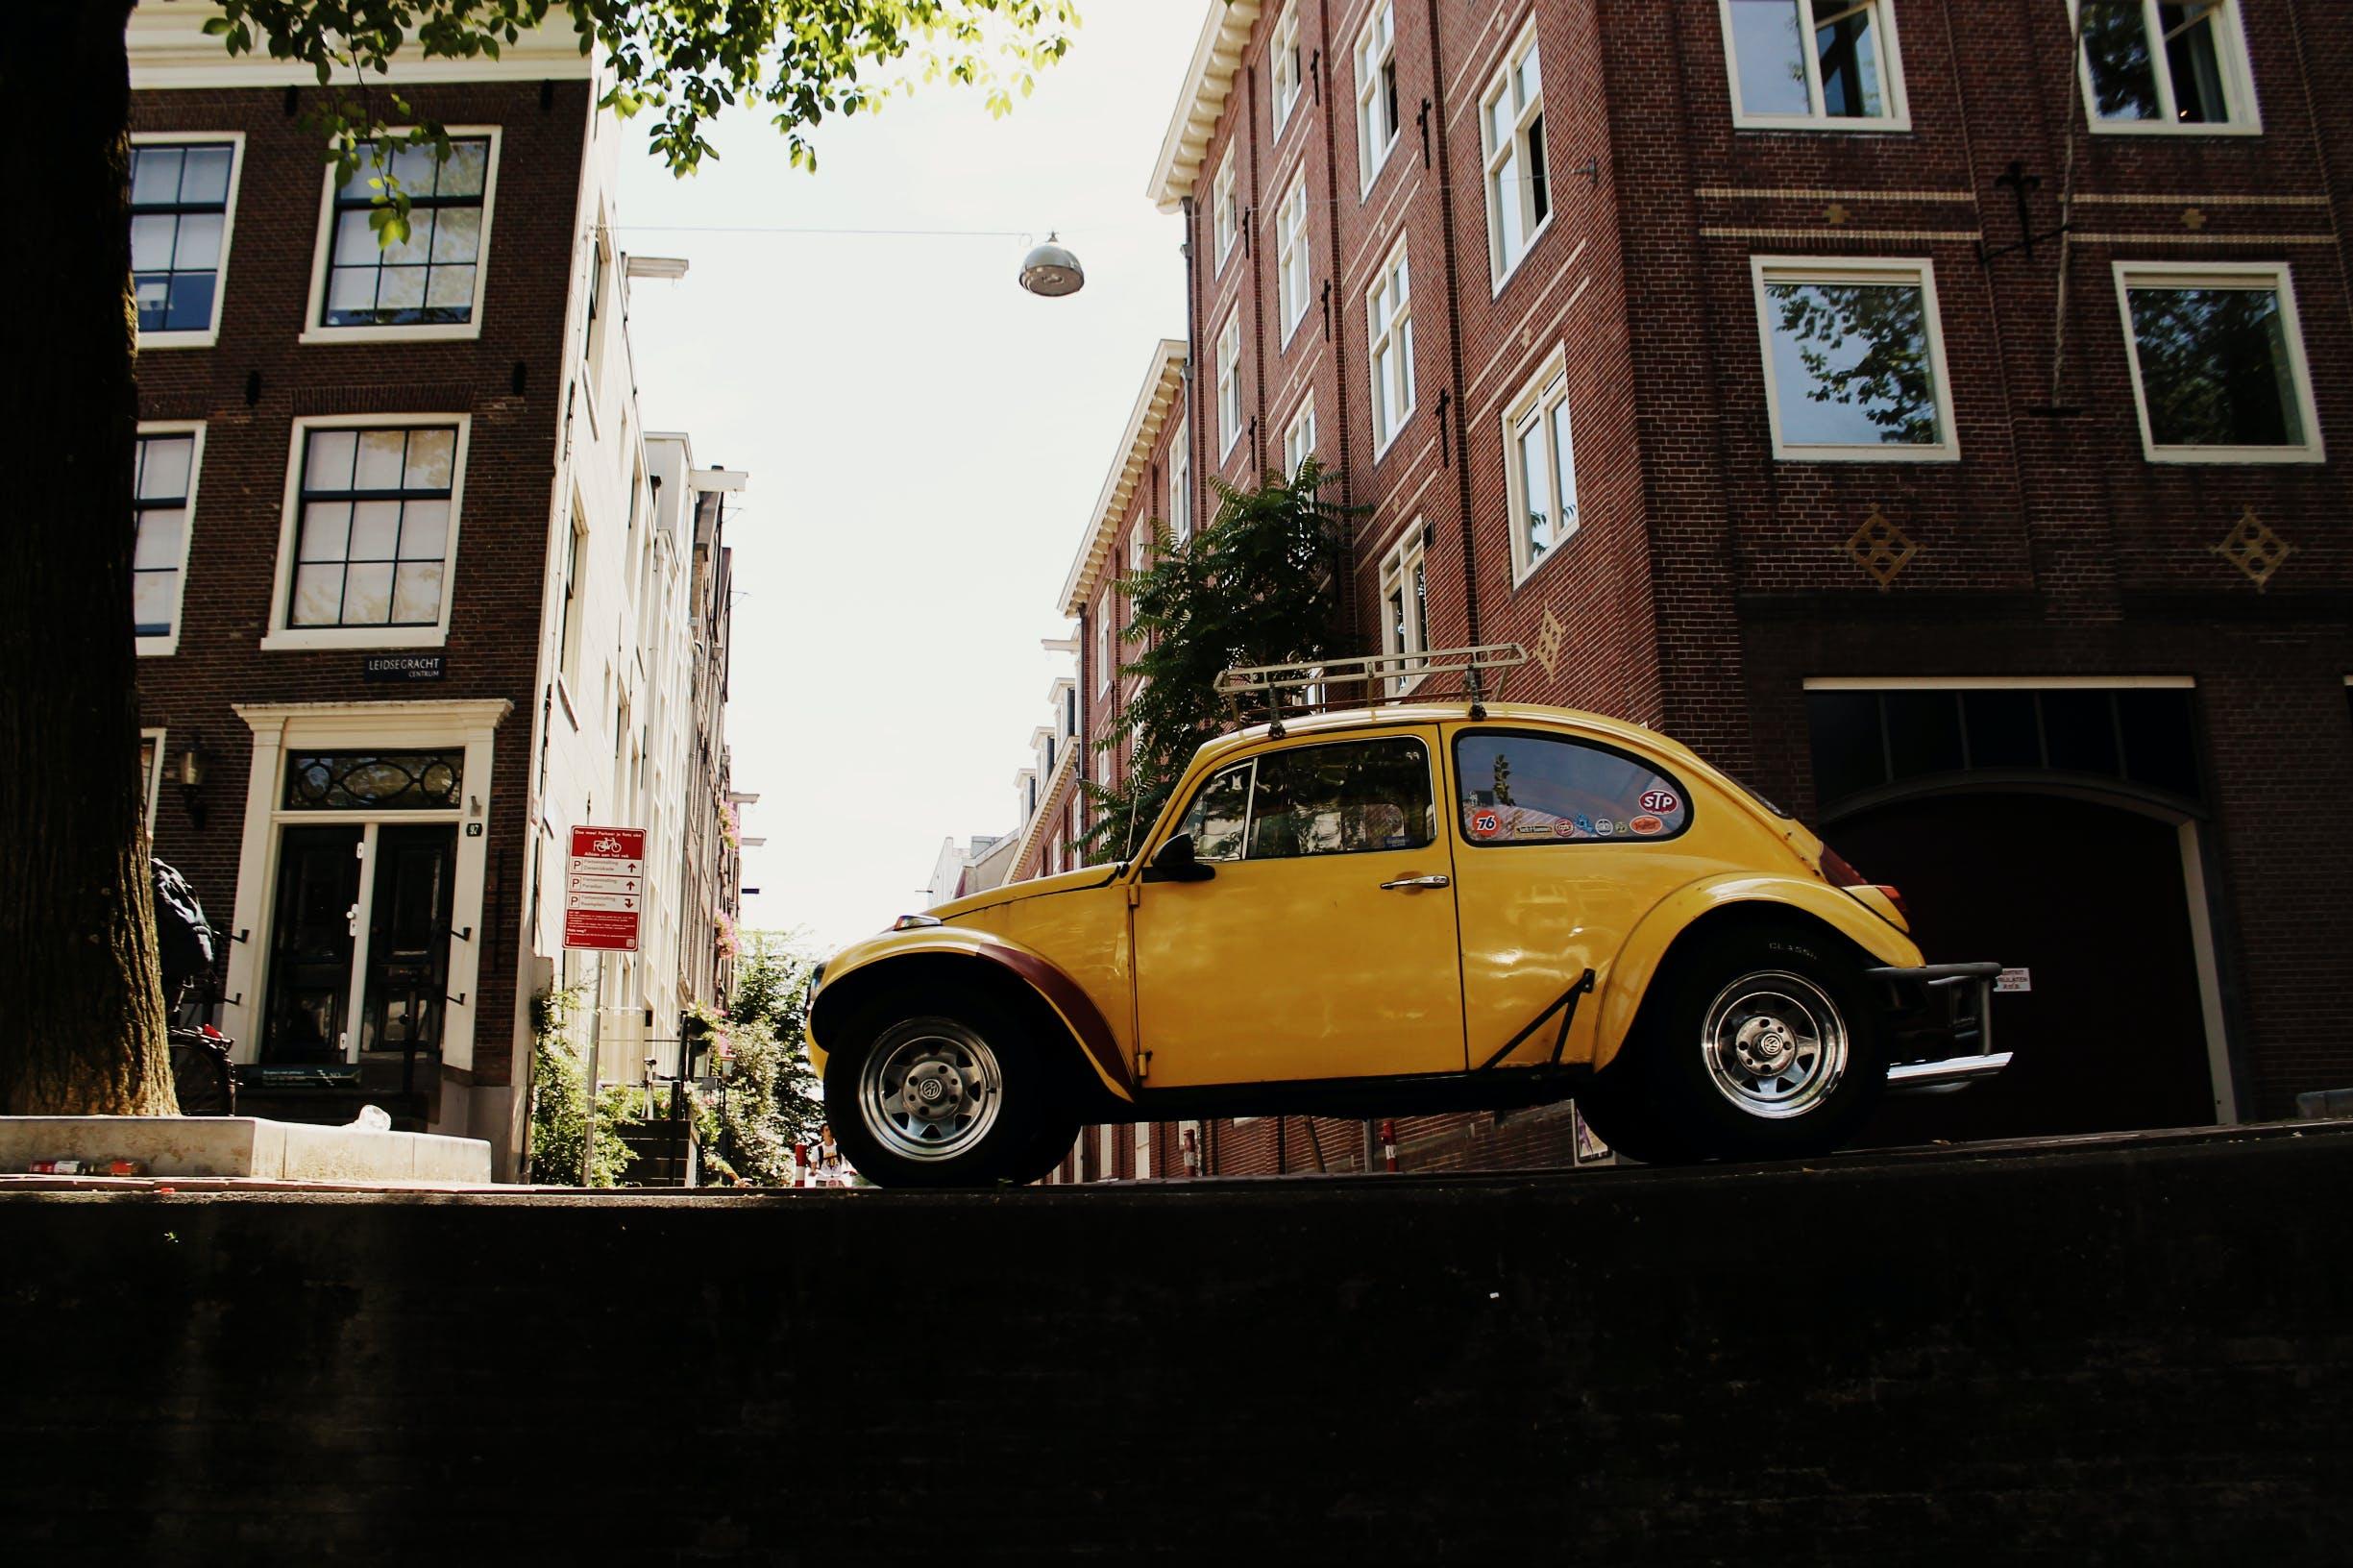 Free stock photo of yellow car